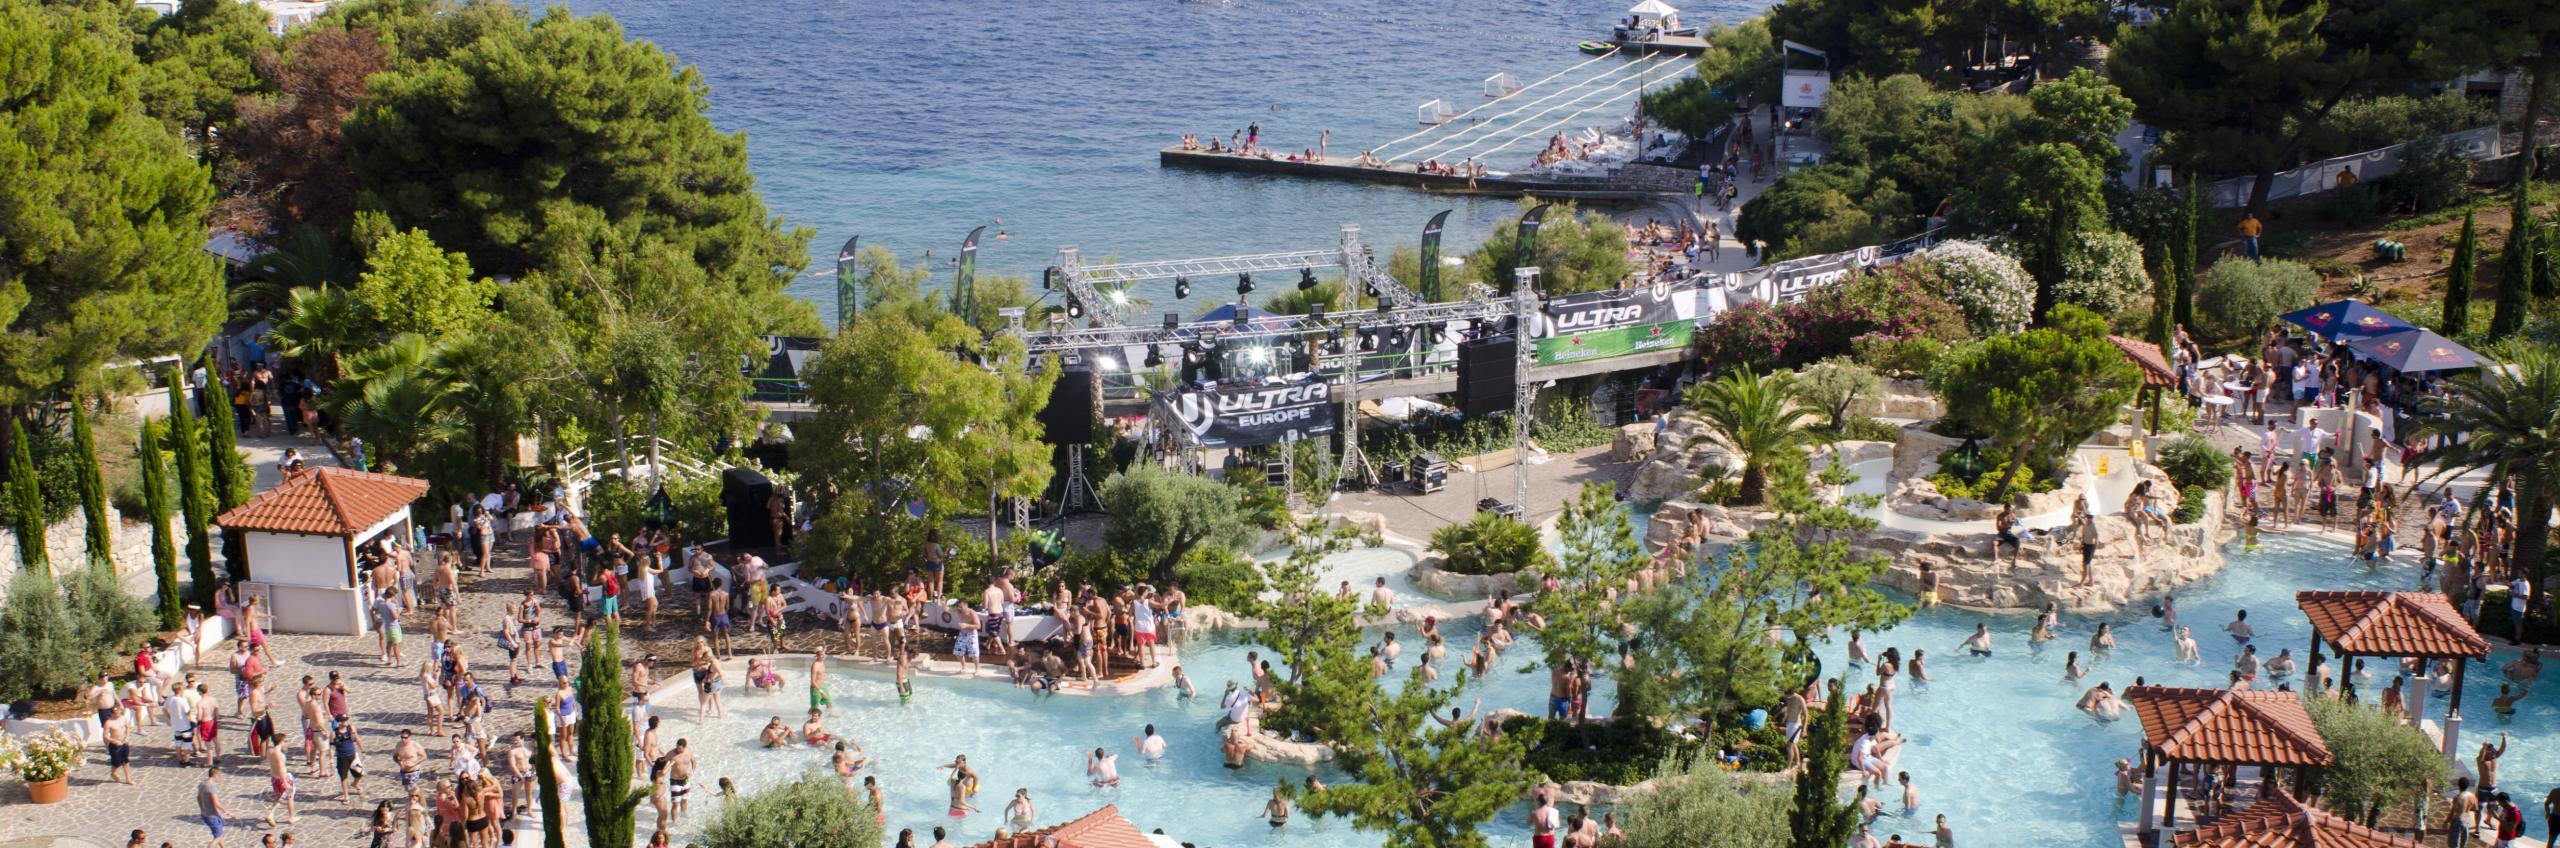 'Infinity' pool at Amfora grand beach resort